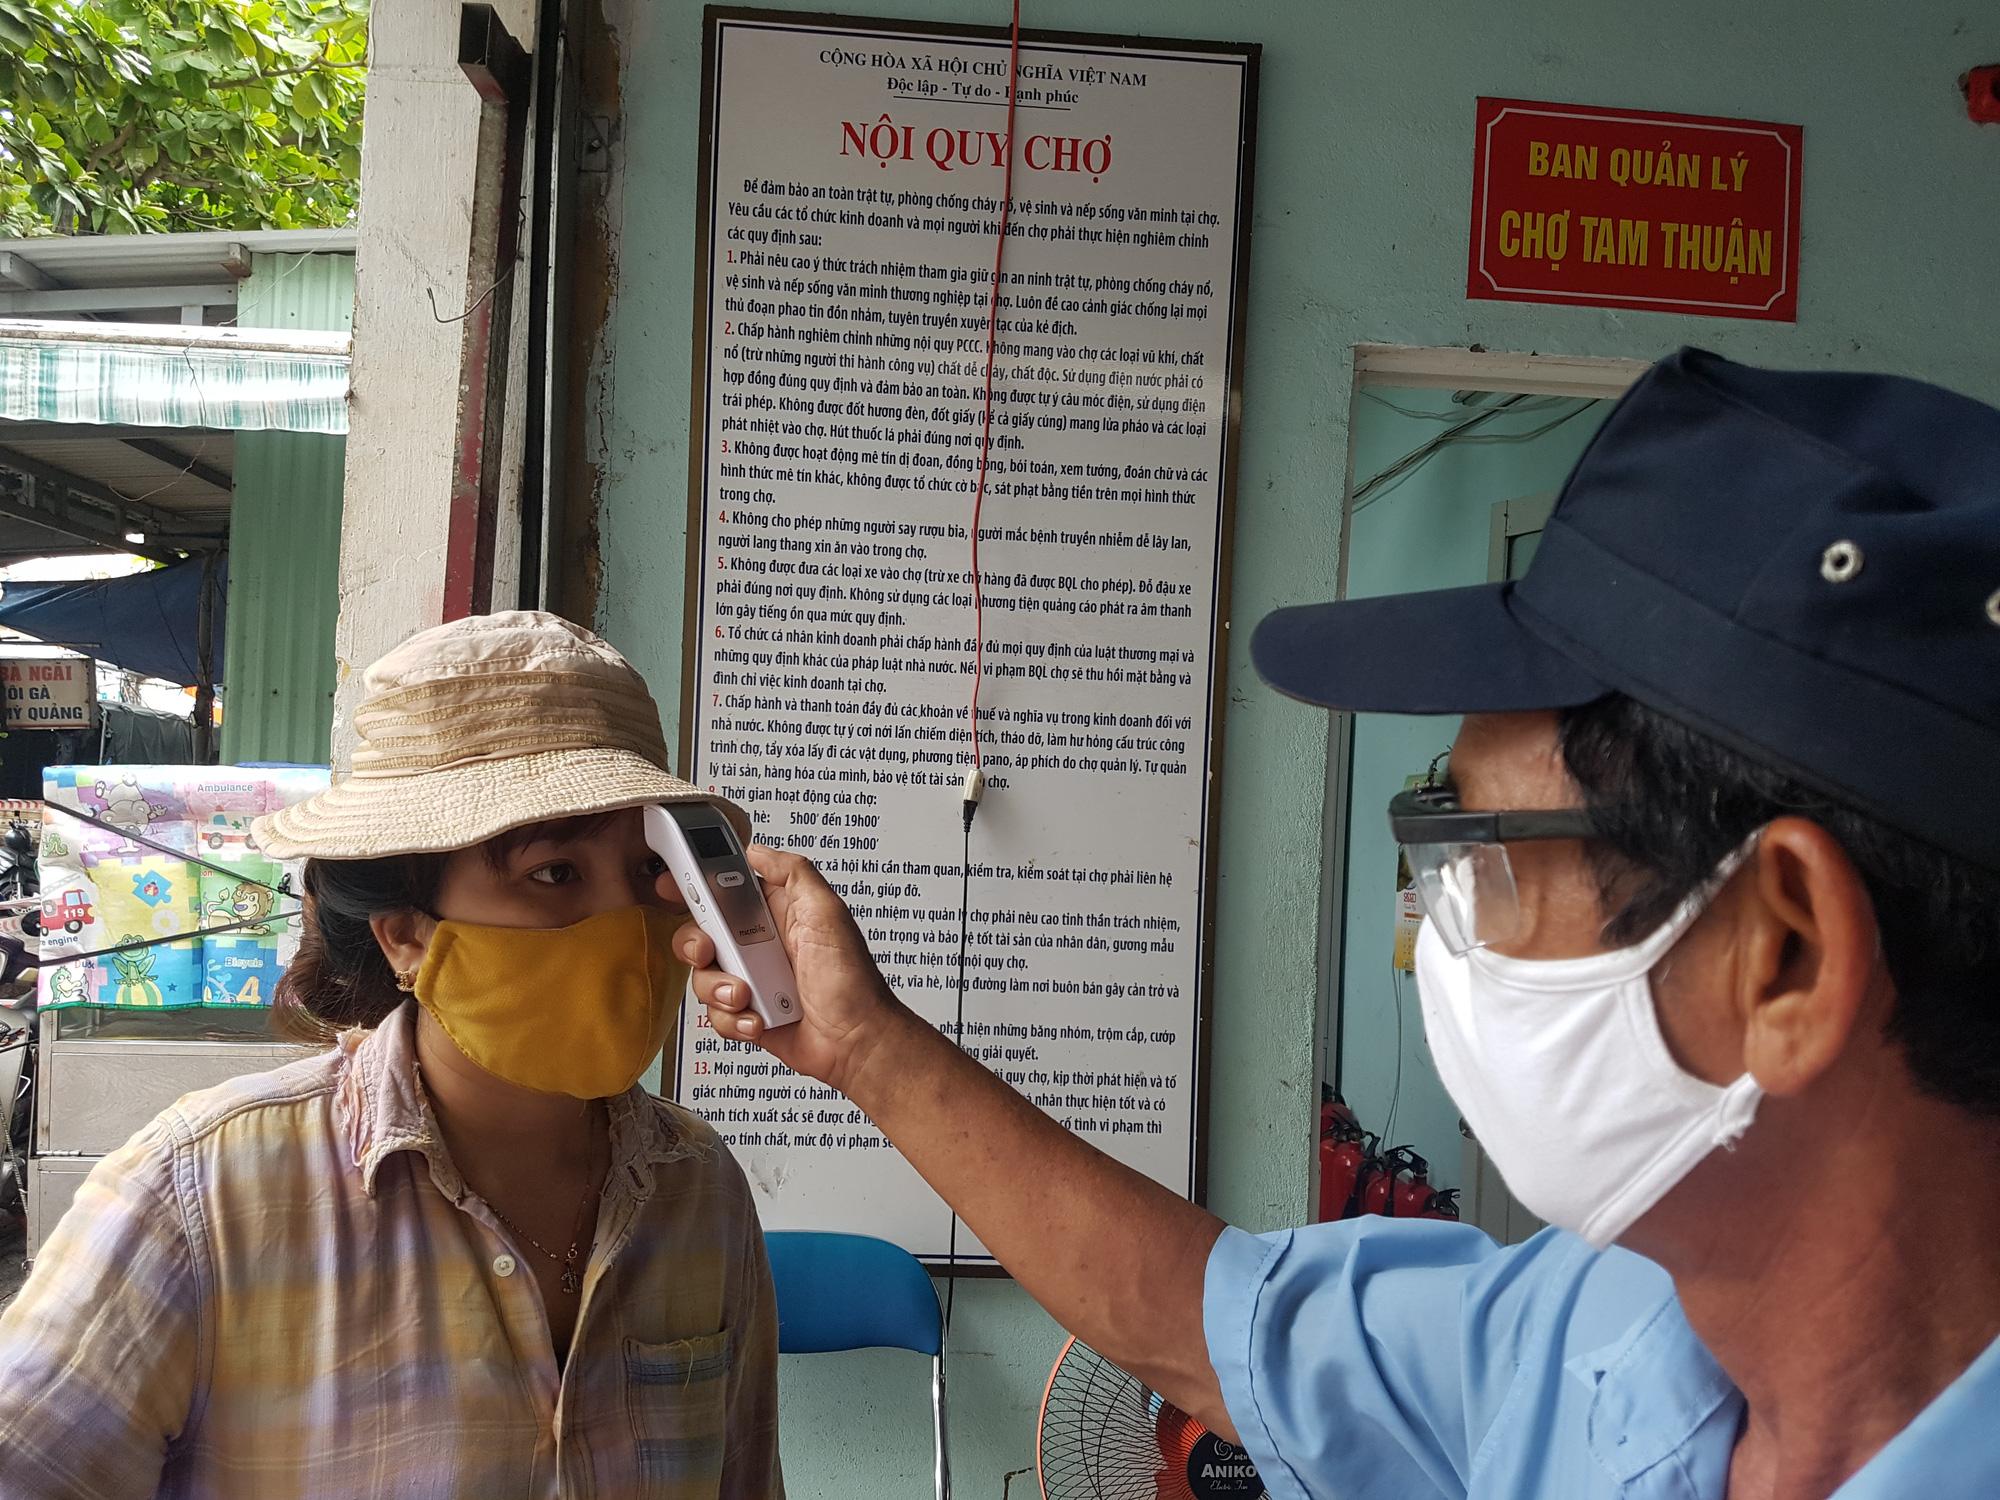 A woman has her body temperature measured before entering a market in Da Nang City, Vietnam, August 12, 2020. Photo: Huu Kha / Tuoi Tre